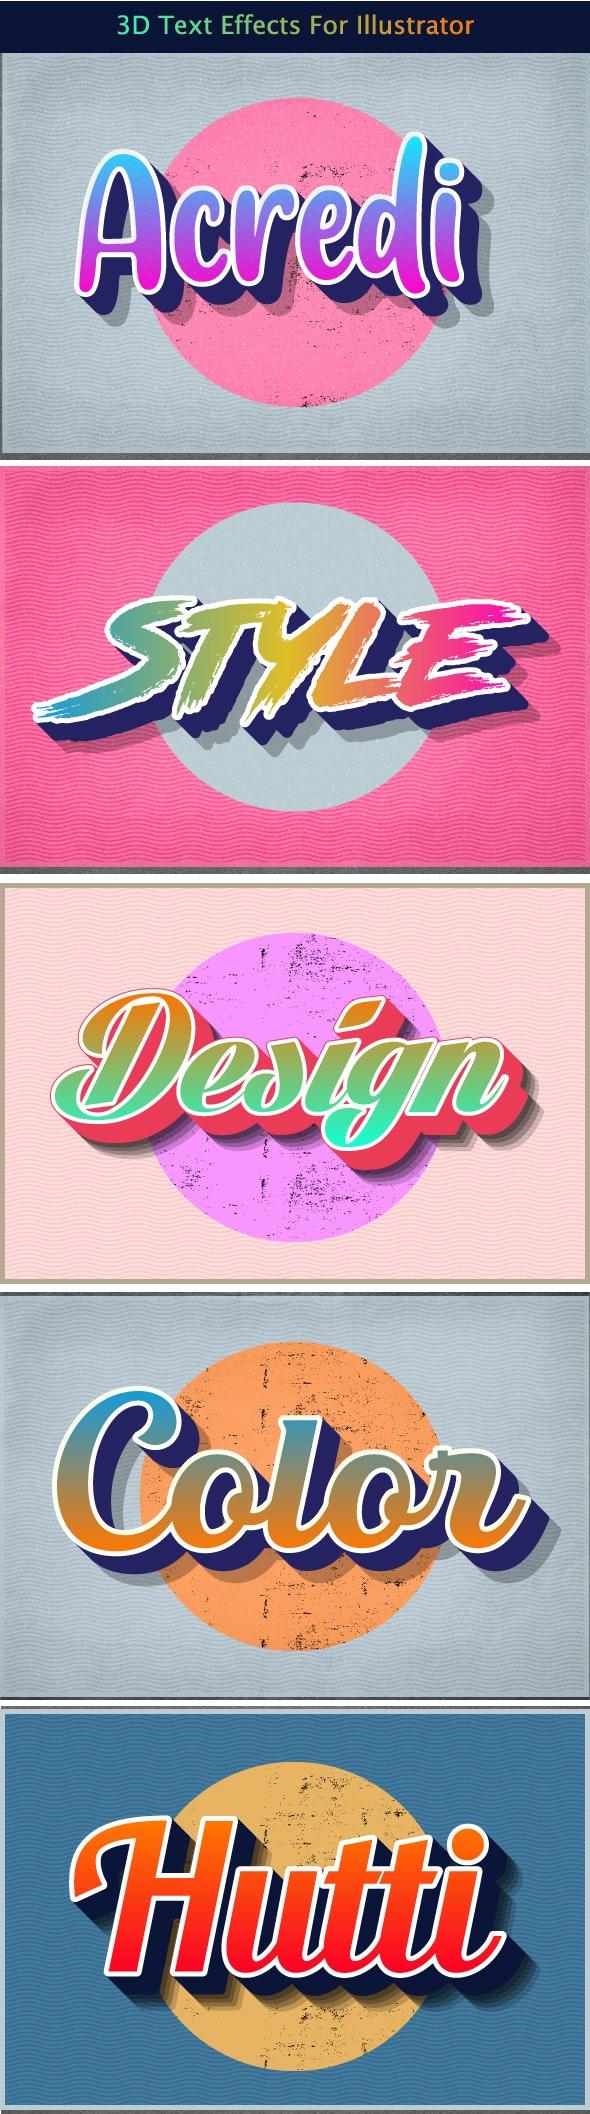 3d Text Effects for Illustrator - Styles Illustrator